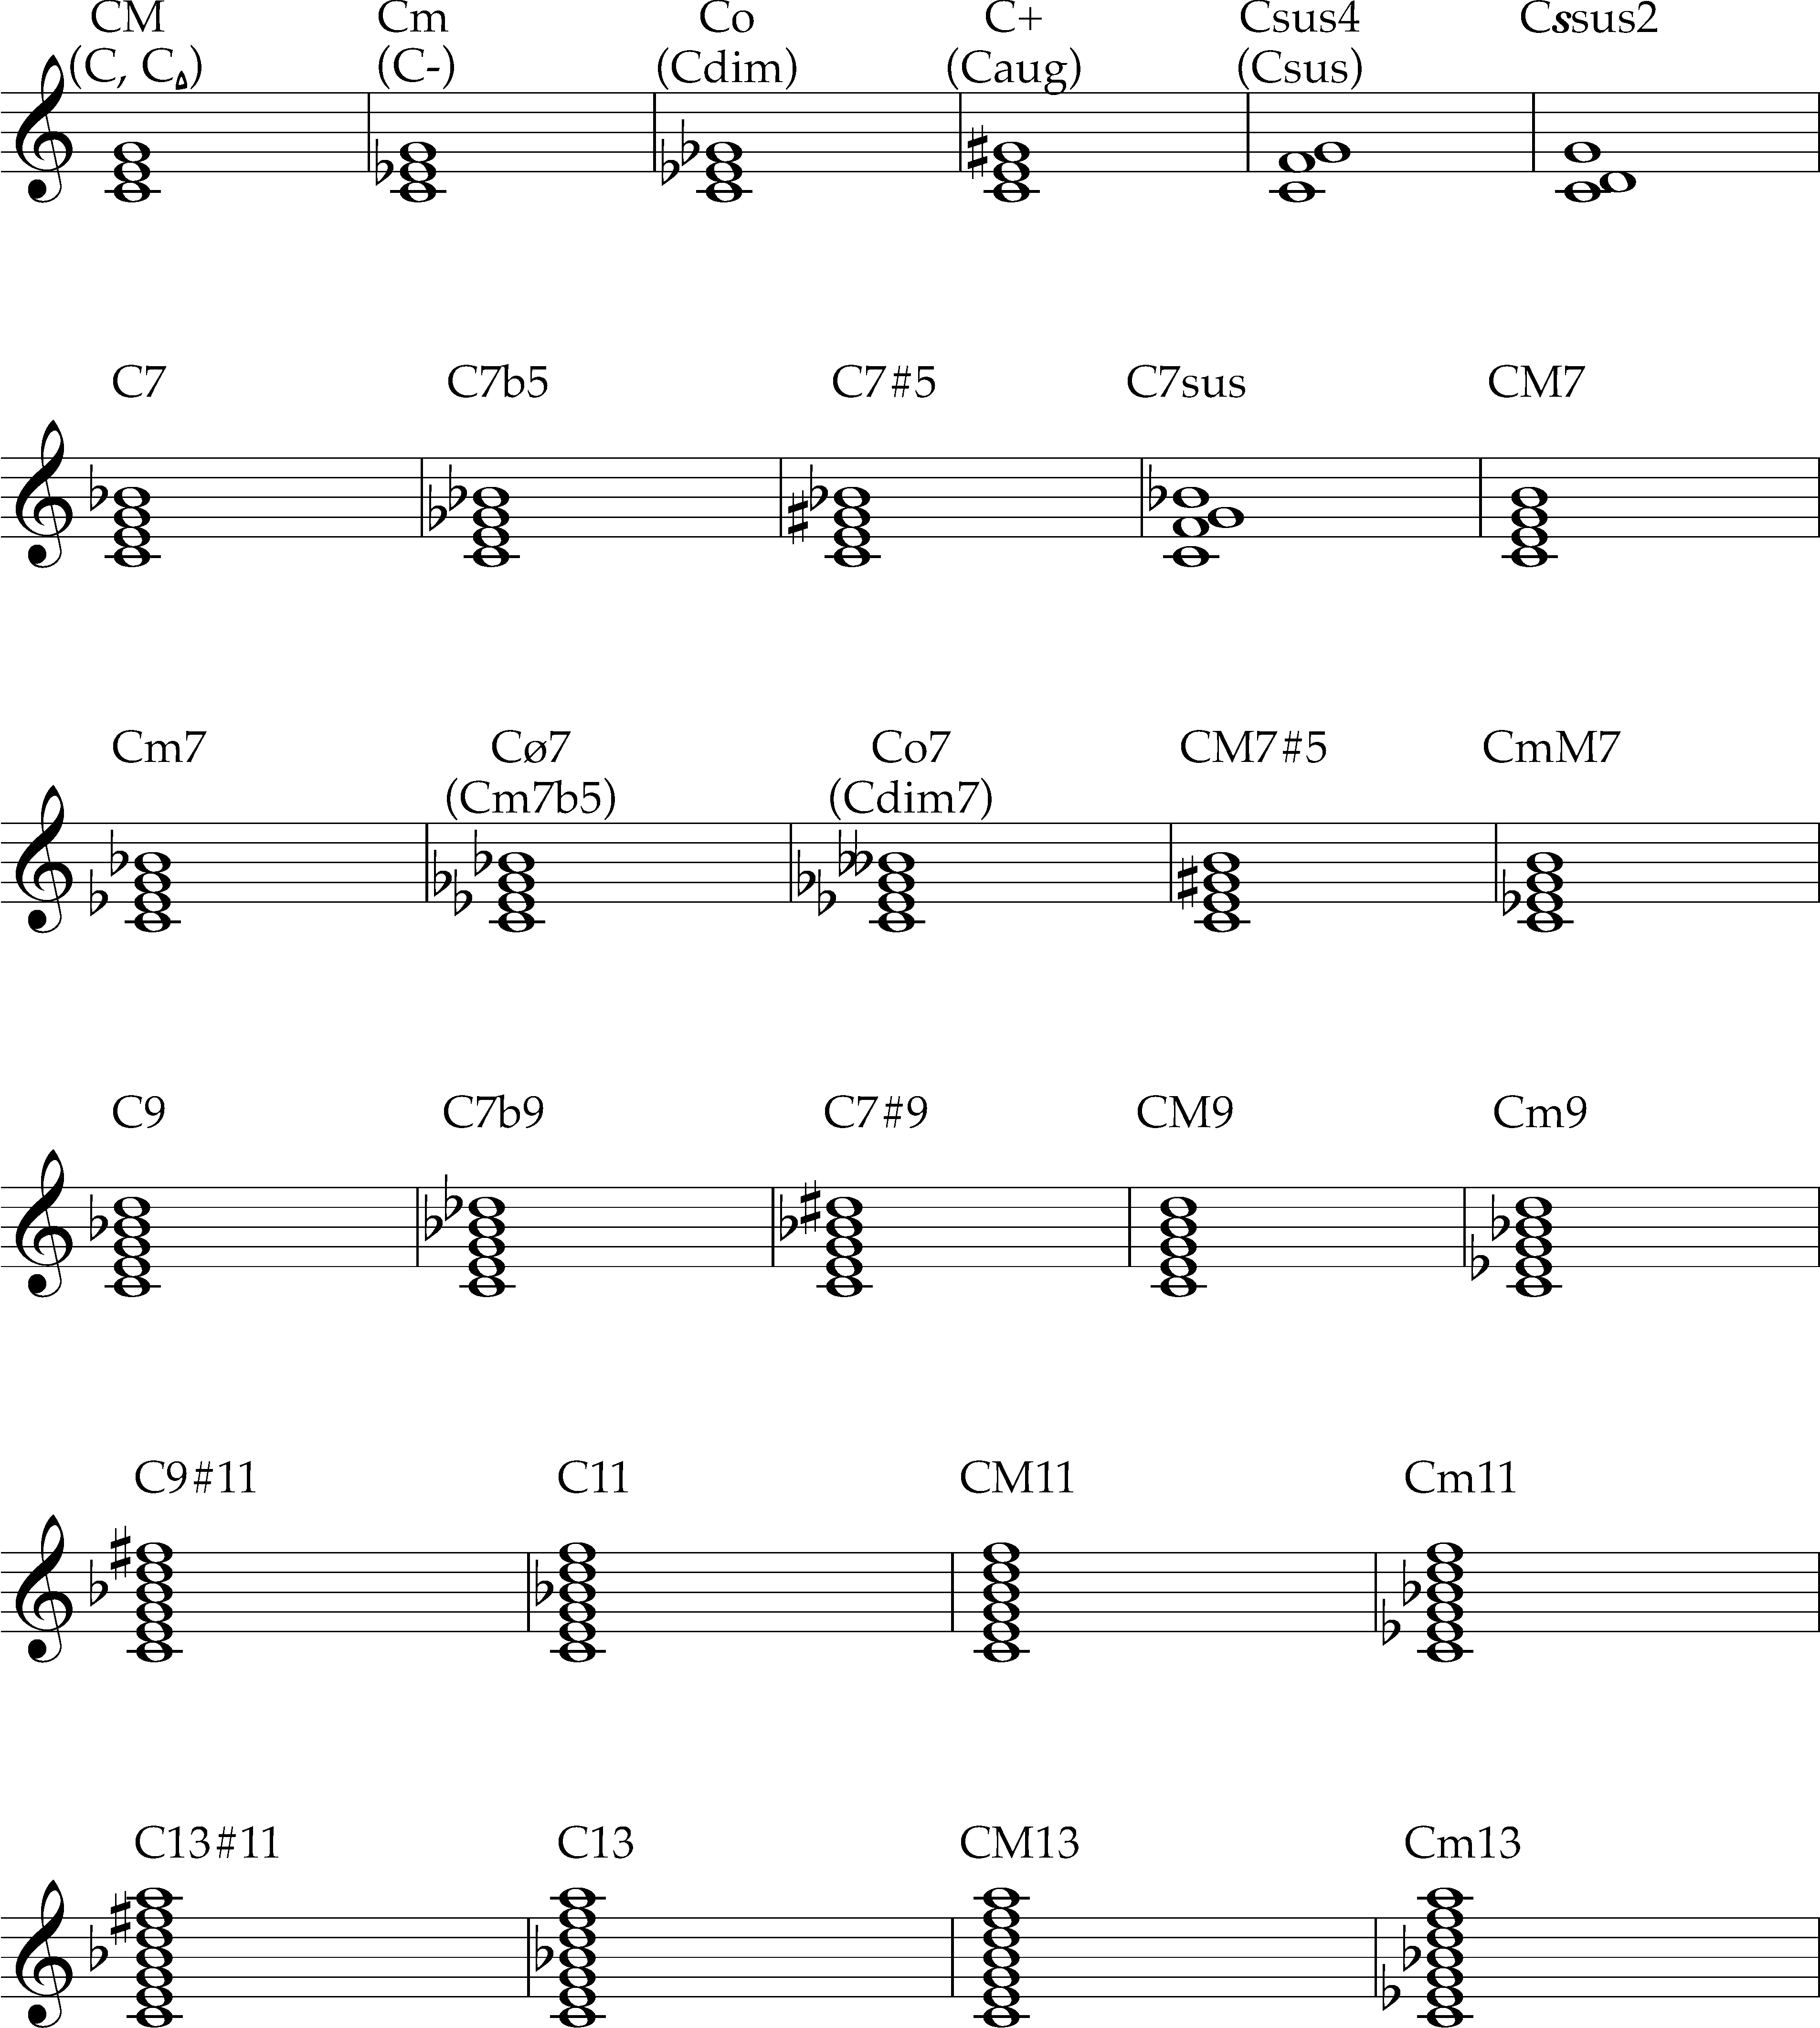 Chord Musicianship And Theory Iv Mus2204 Spring 2018 Uiowa Wiki